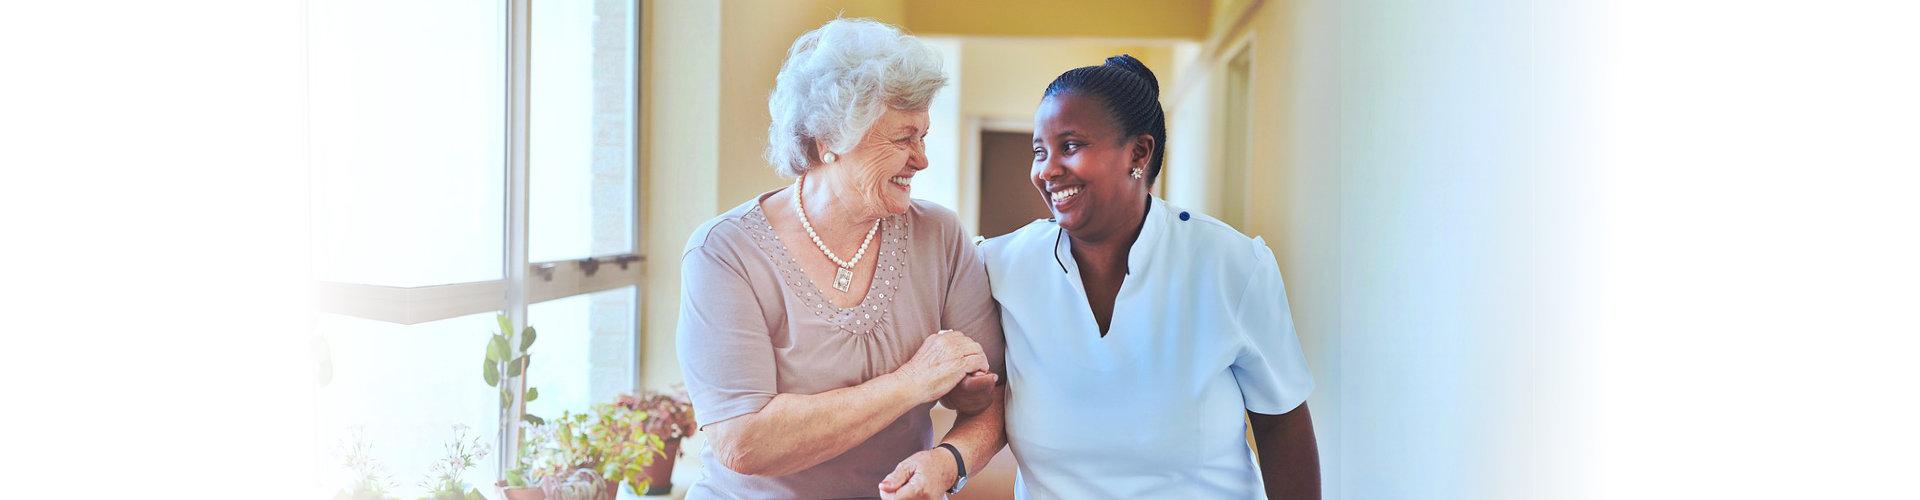 elderly talking to nurse